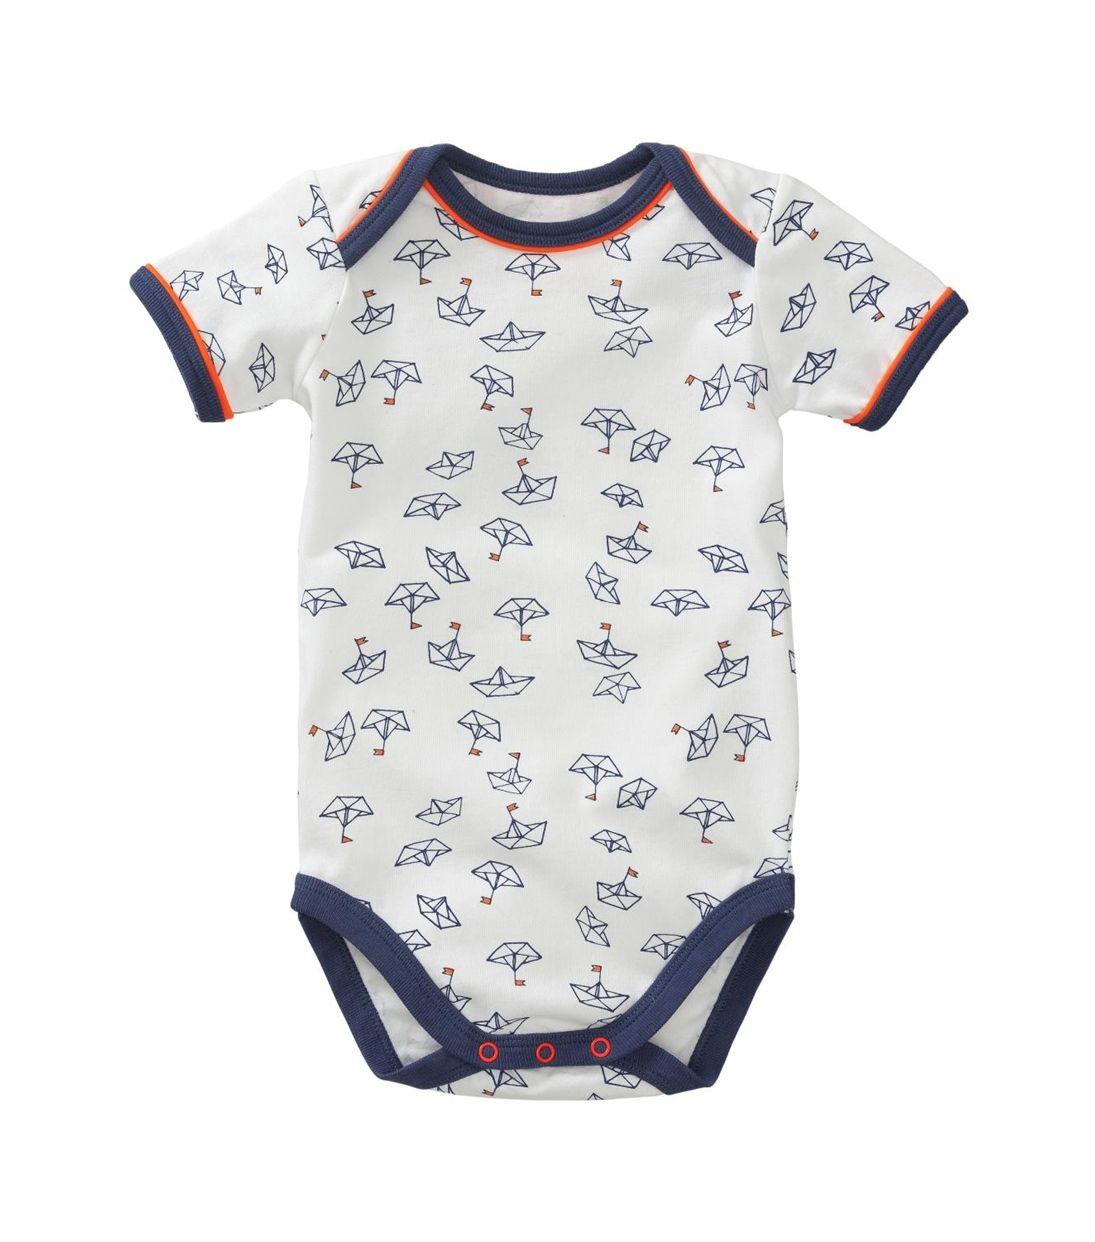 body bébé - coton biologique - HEMA  ff3536705df